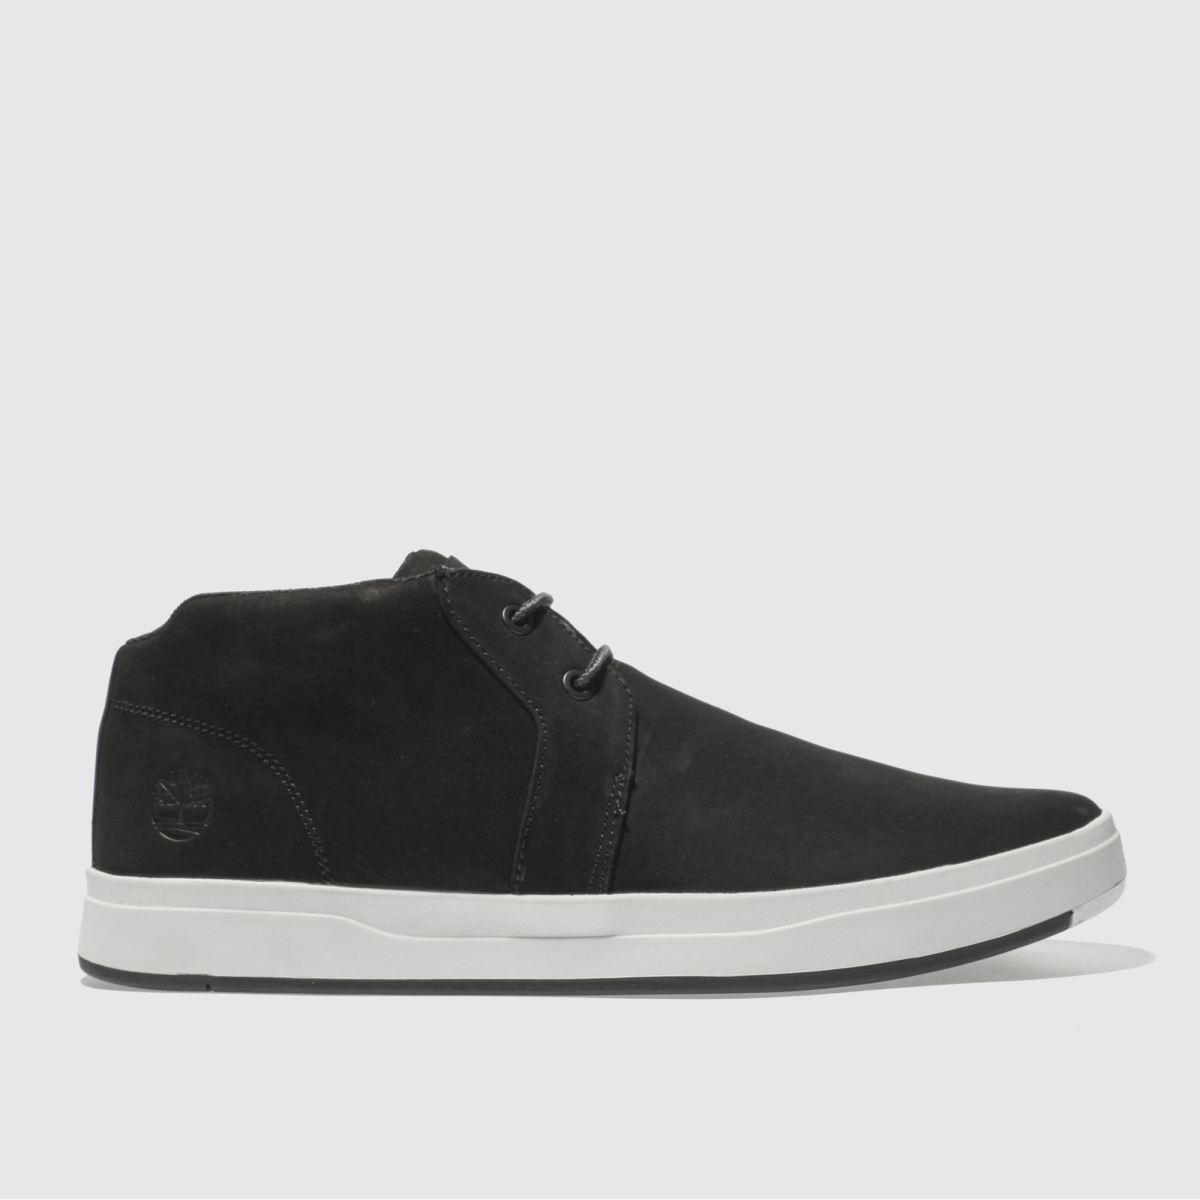 Timberland Black Davis Square Boots